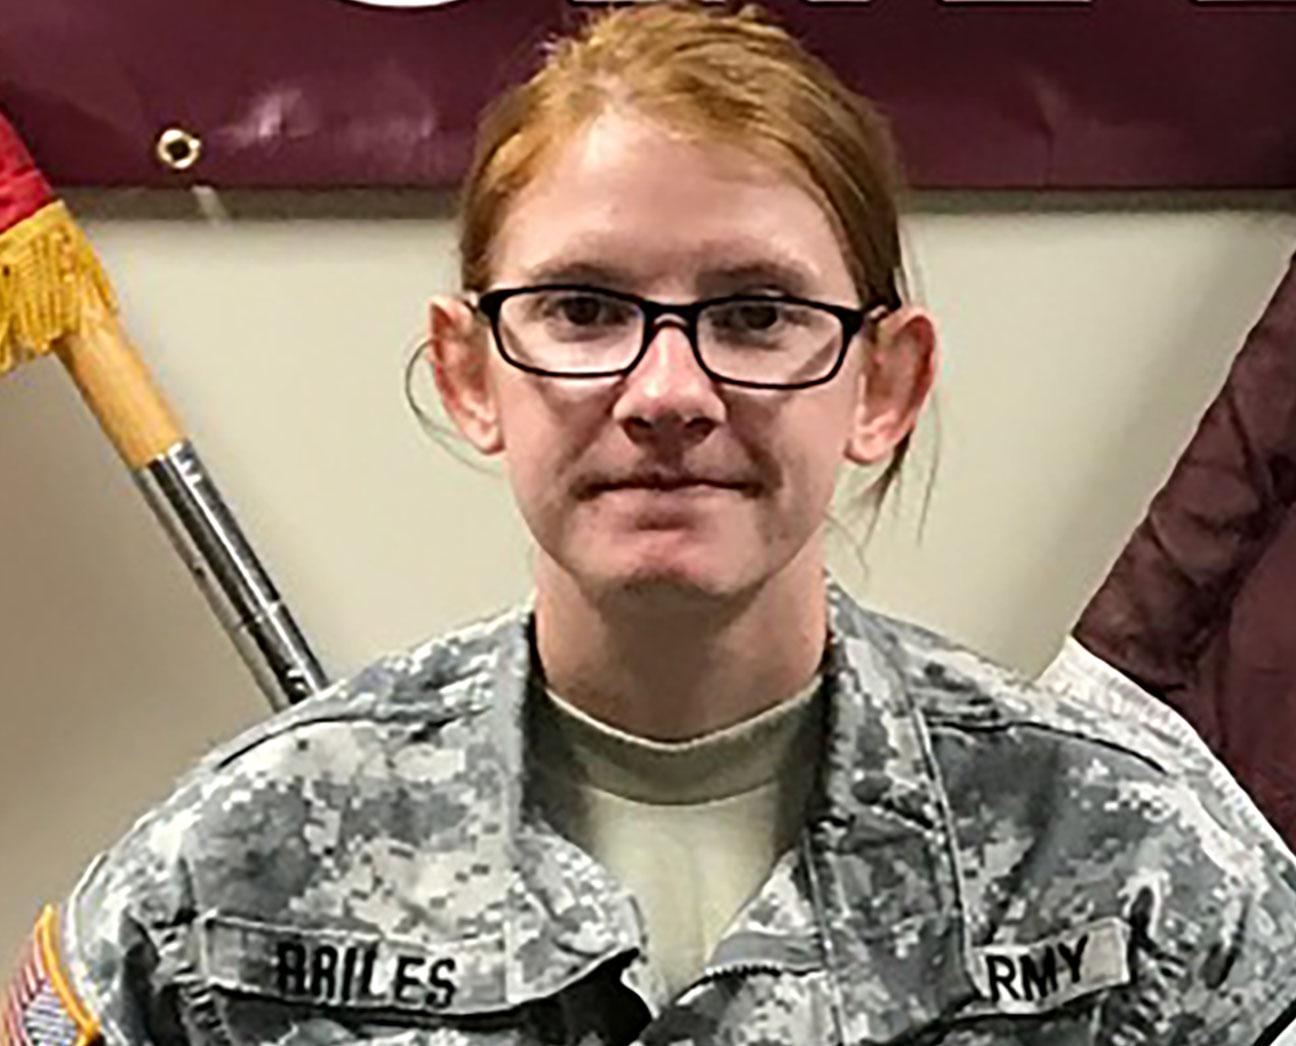 Prvt. Paige Elizabeth Briles, 21, was found unresponsive at her home on Fort Hood on Dec. 24, 2016_392958